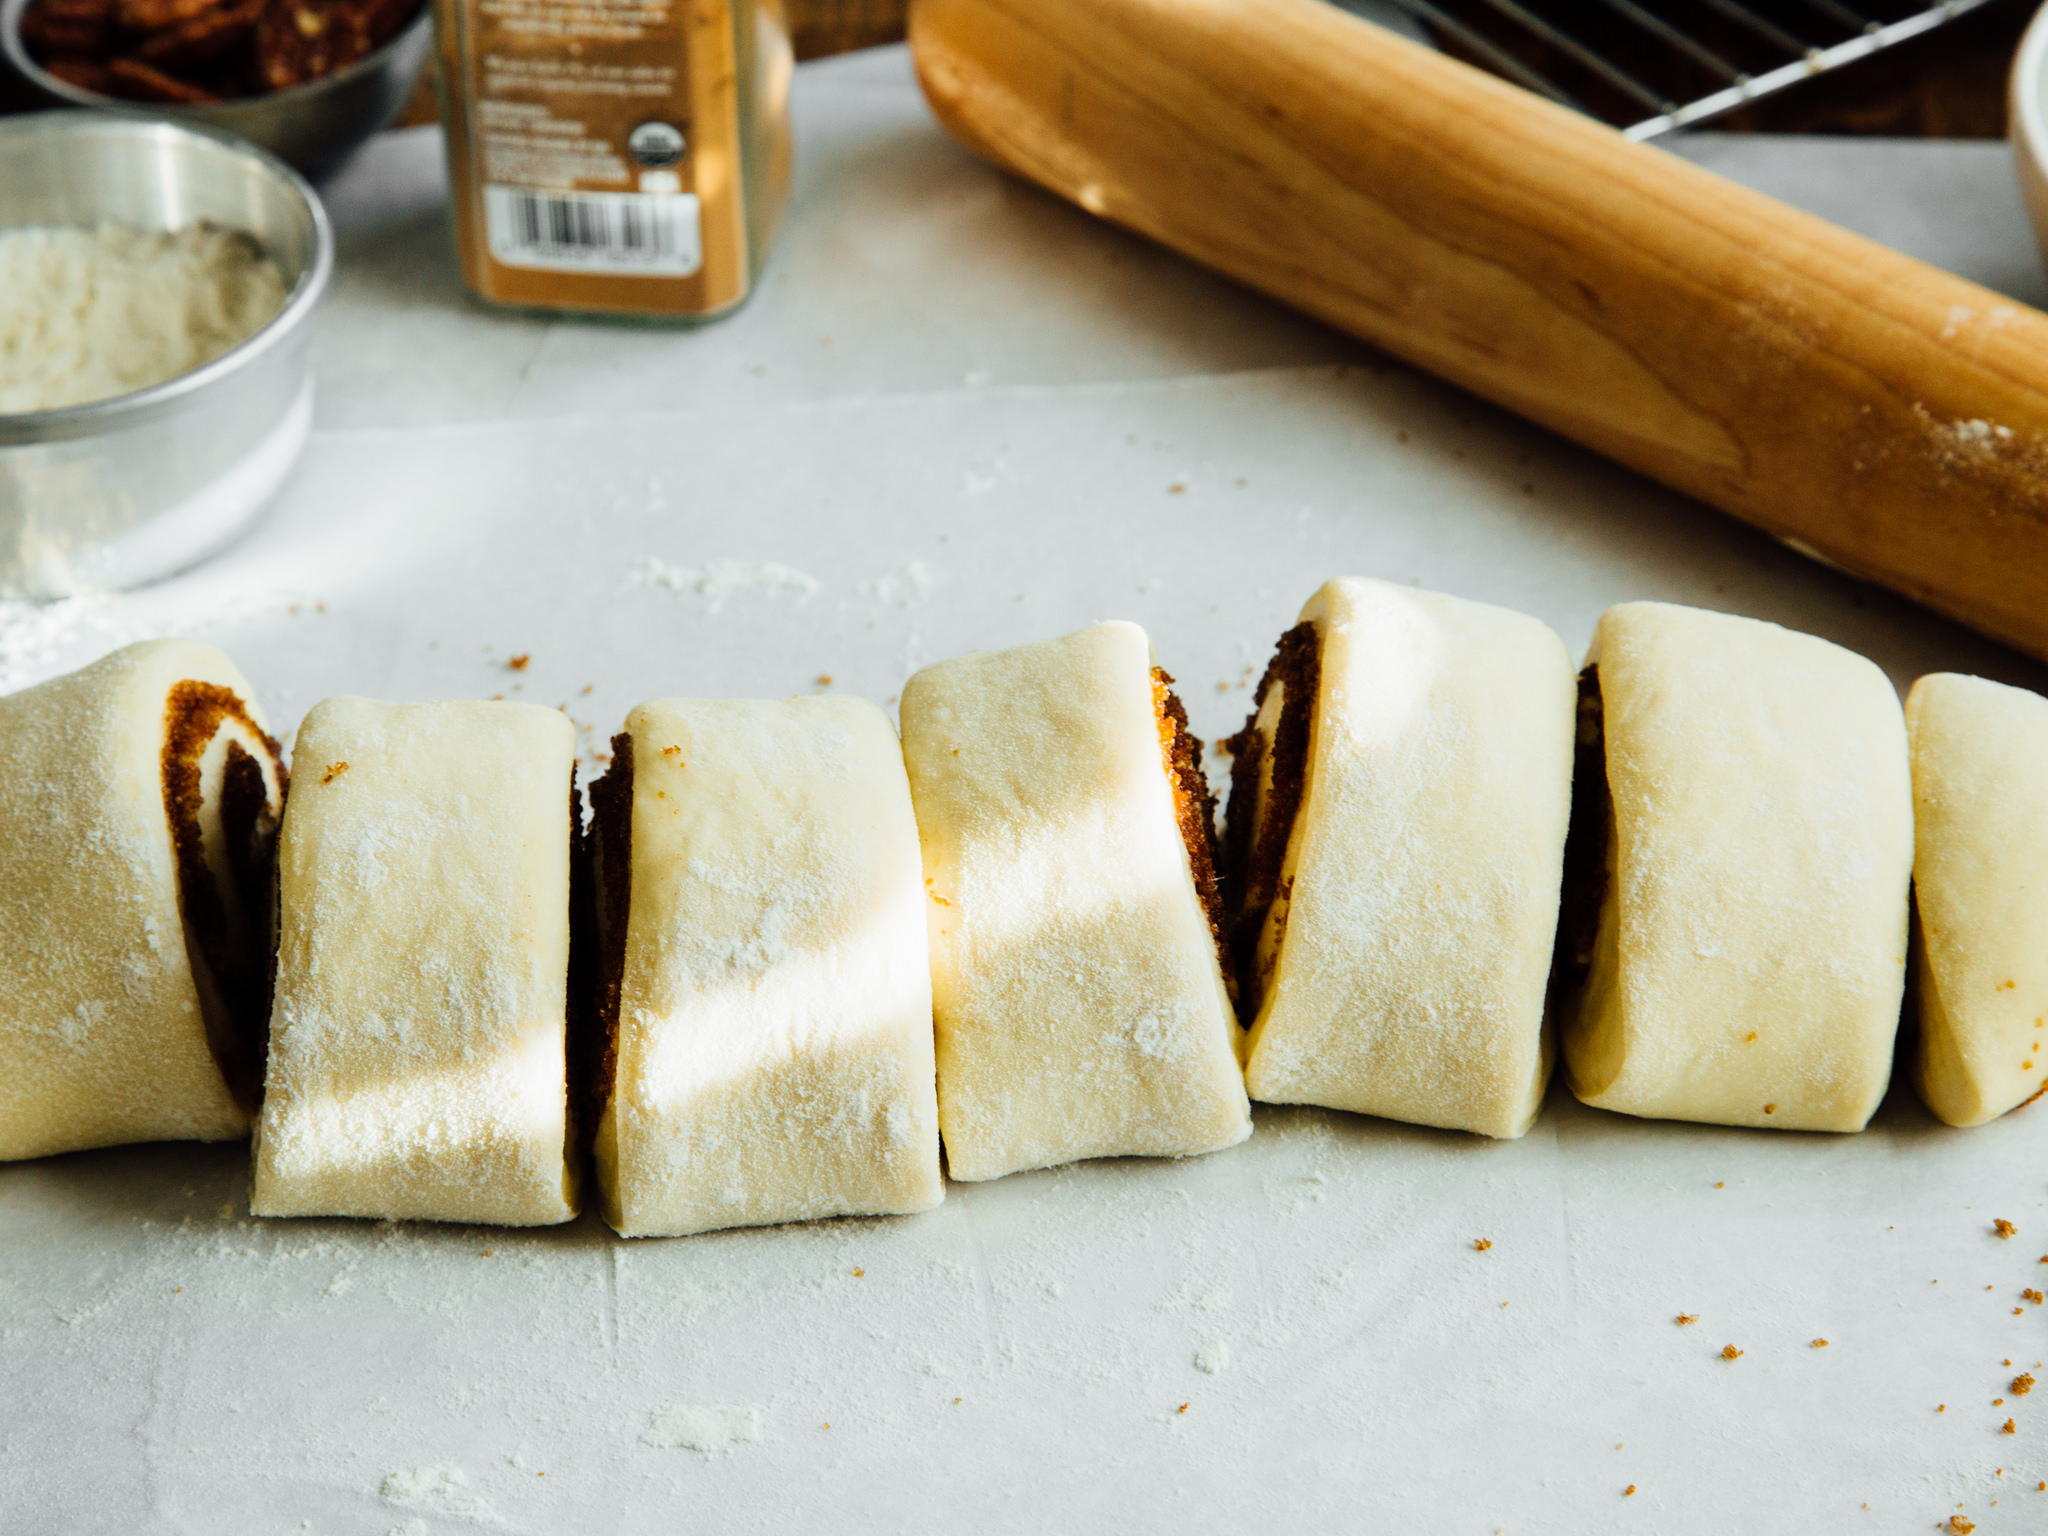 coconut-oil-cinnamon-rolls